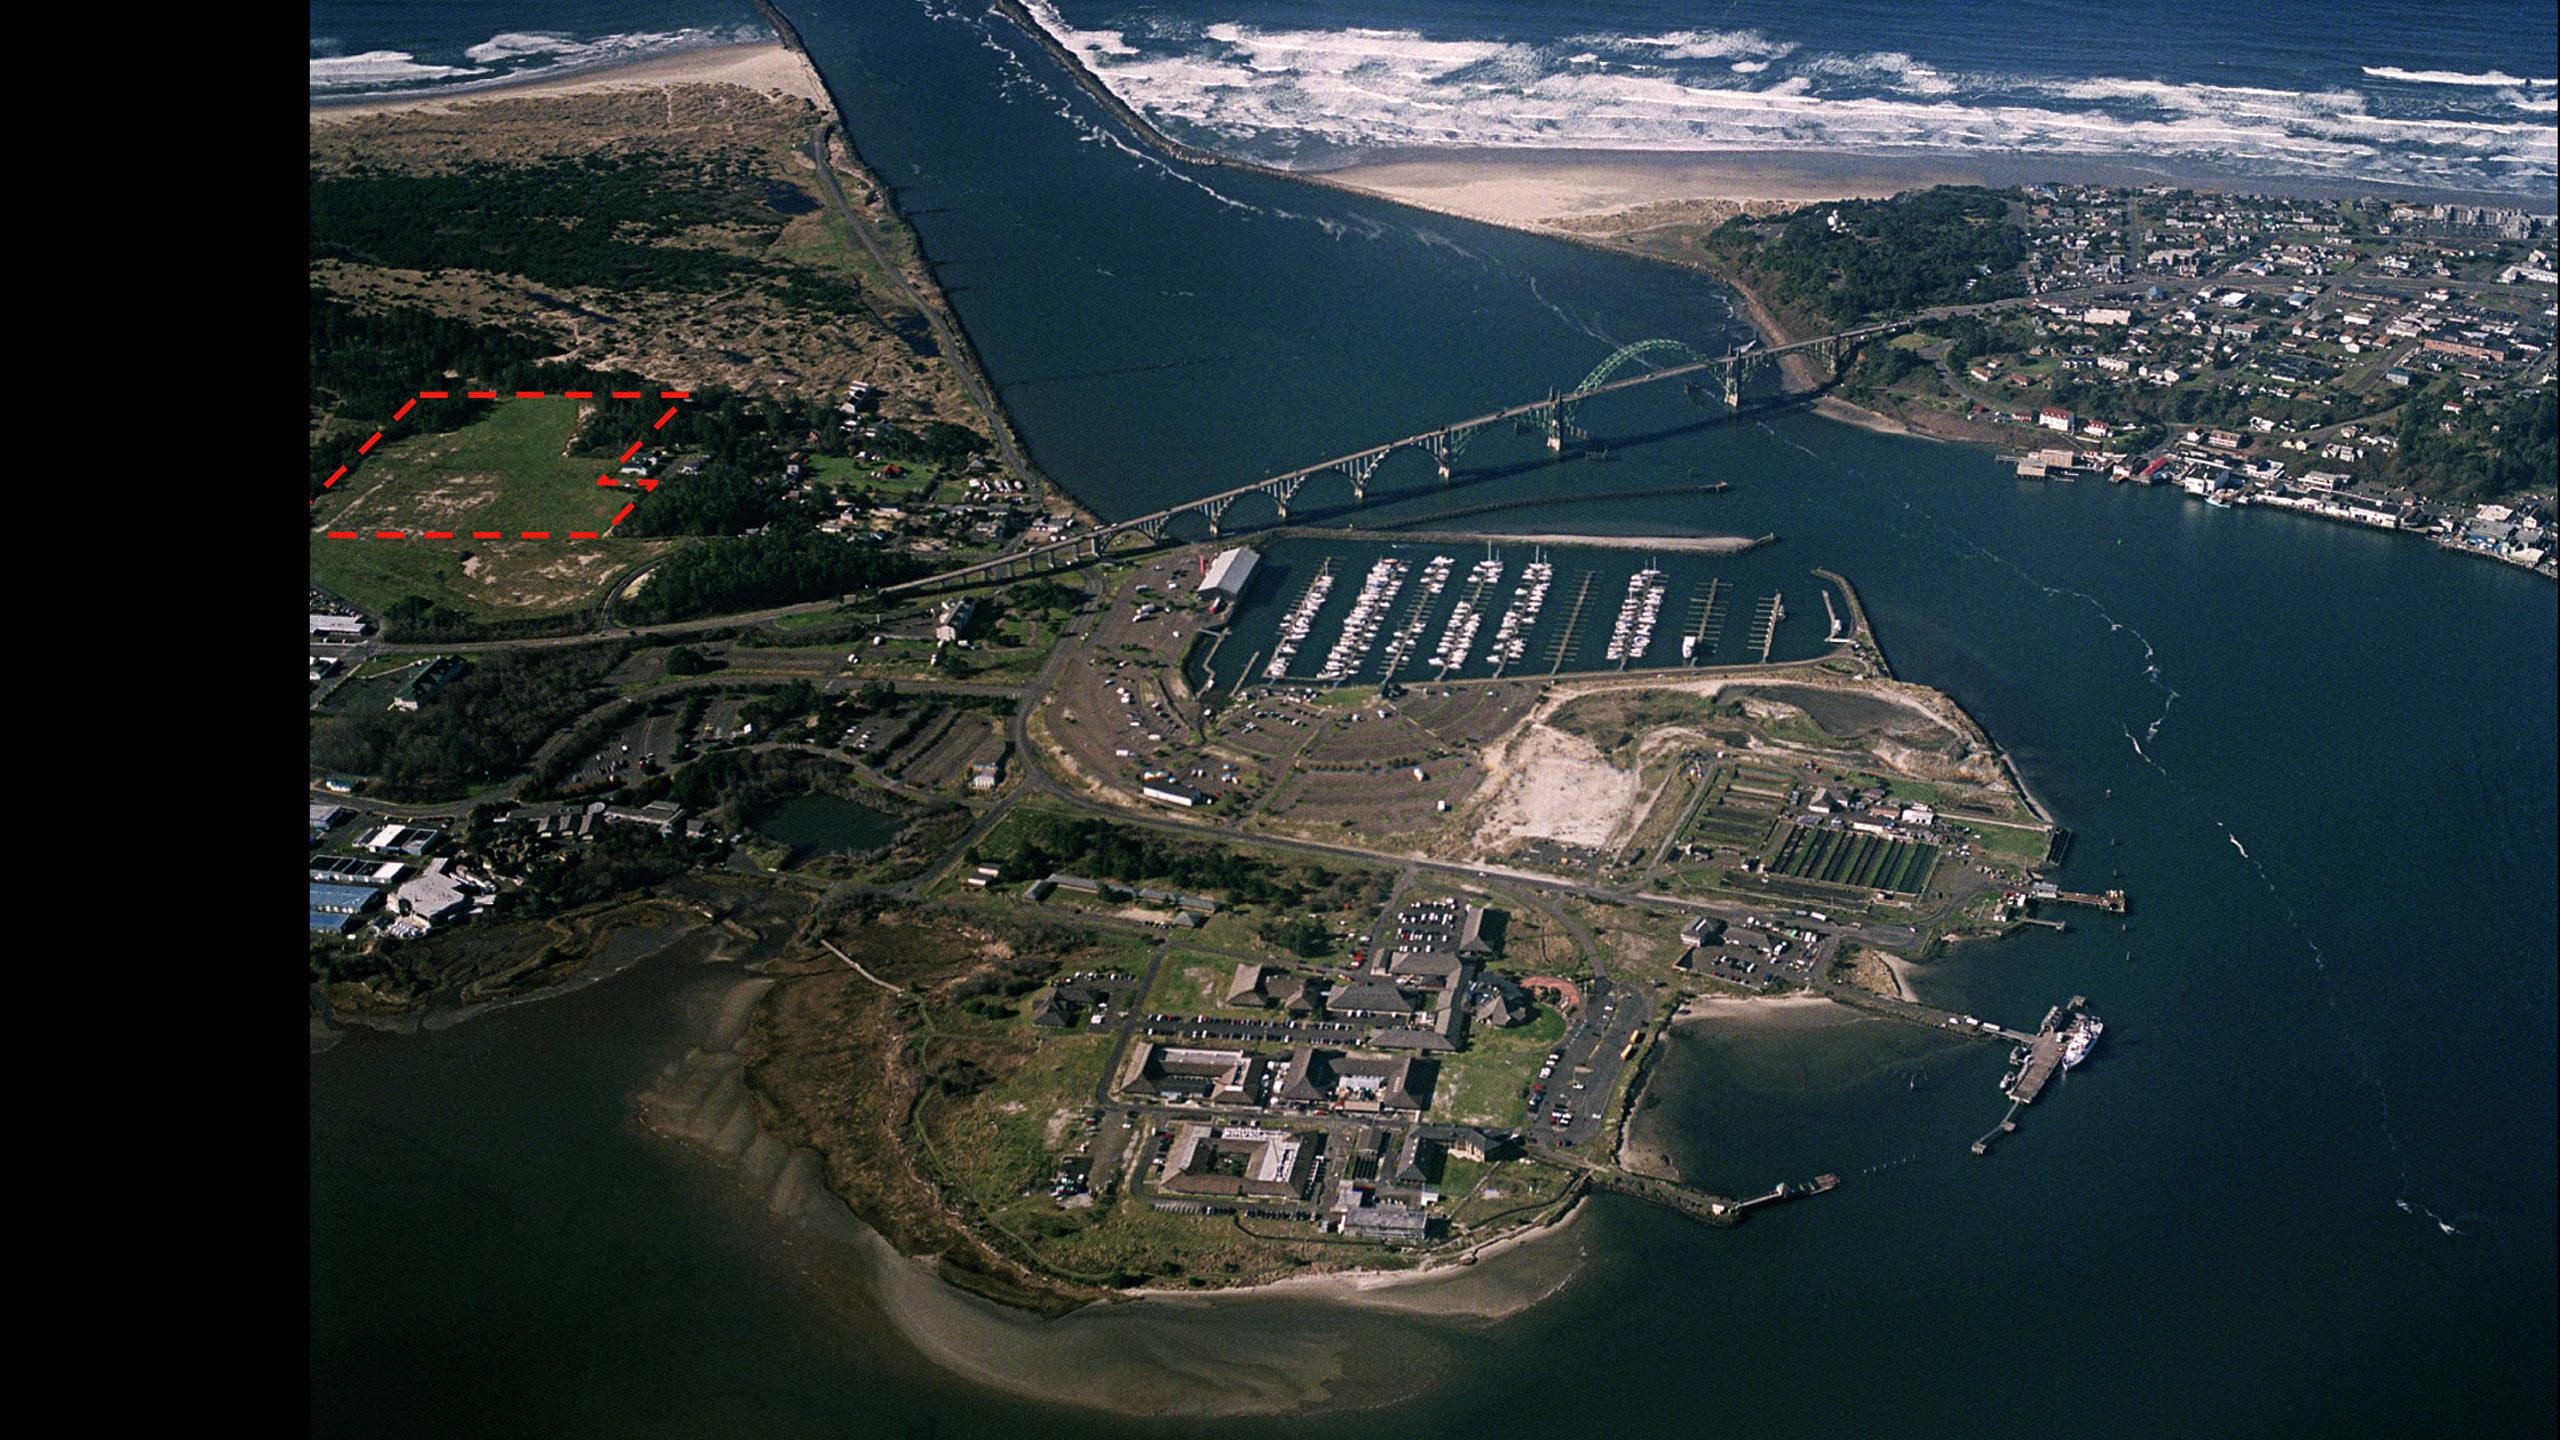 Coastal Discovery Center / image 1